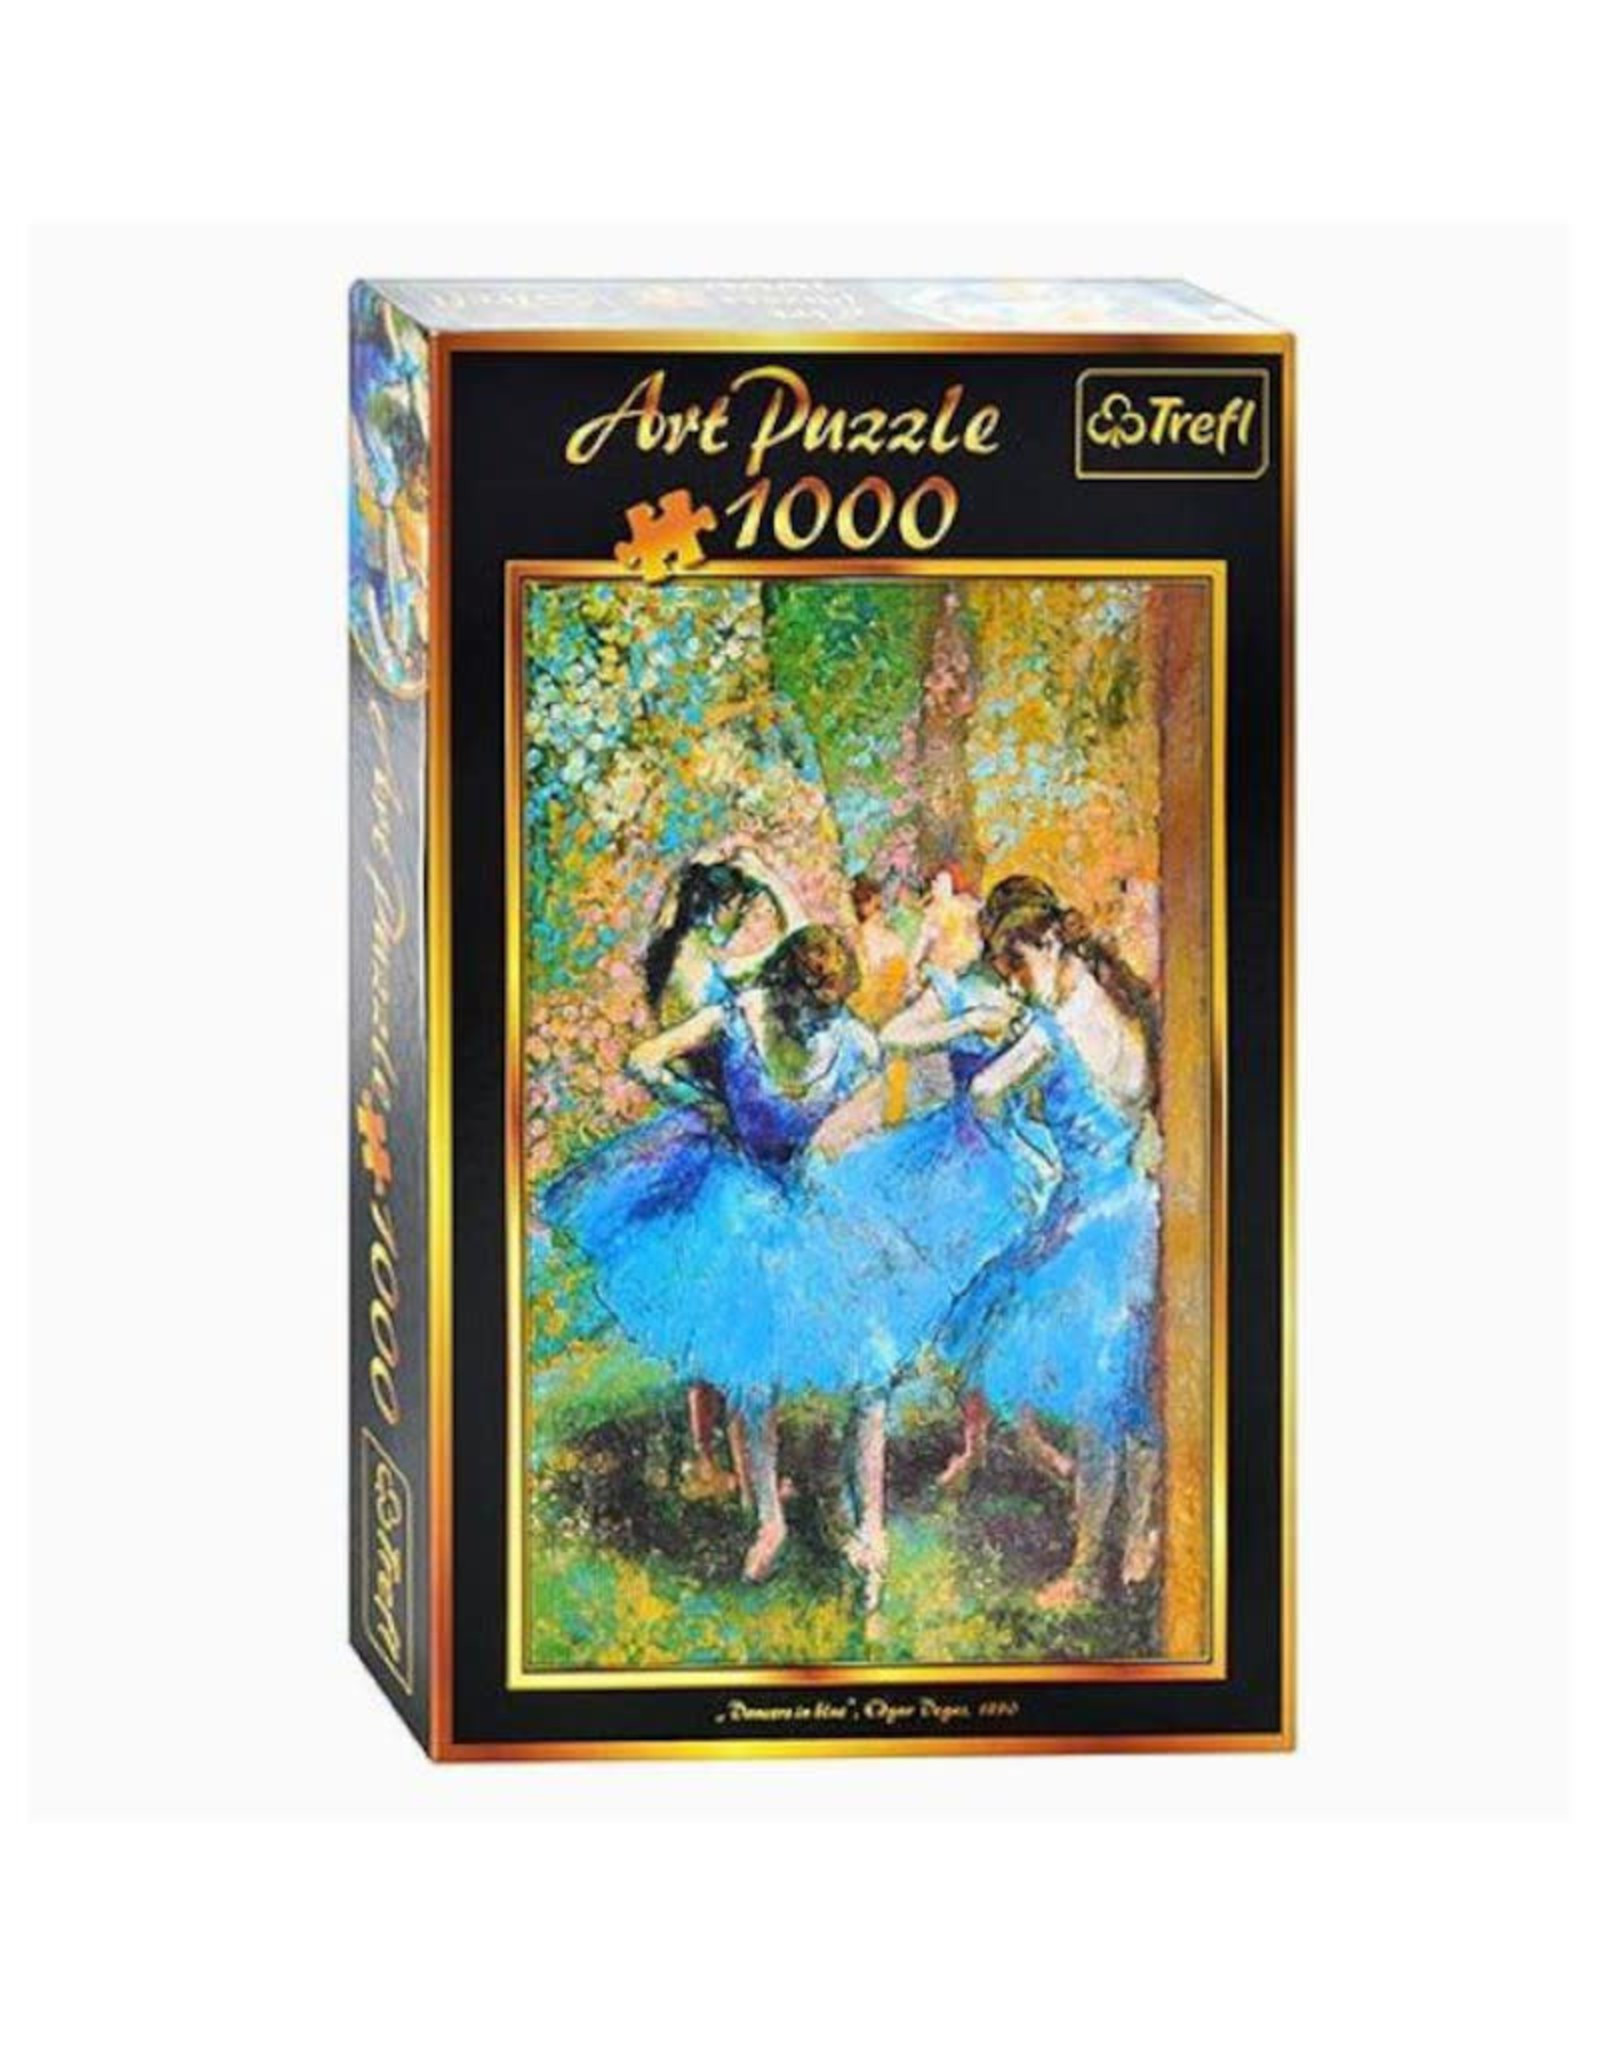 Trefl Dancer in Blue Puzzle 1000 PCS (Edgar Degas)